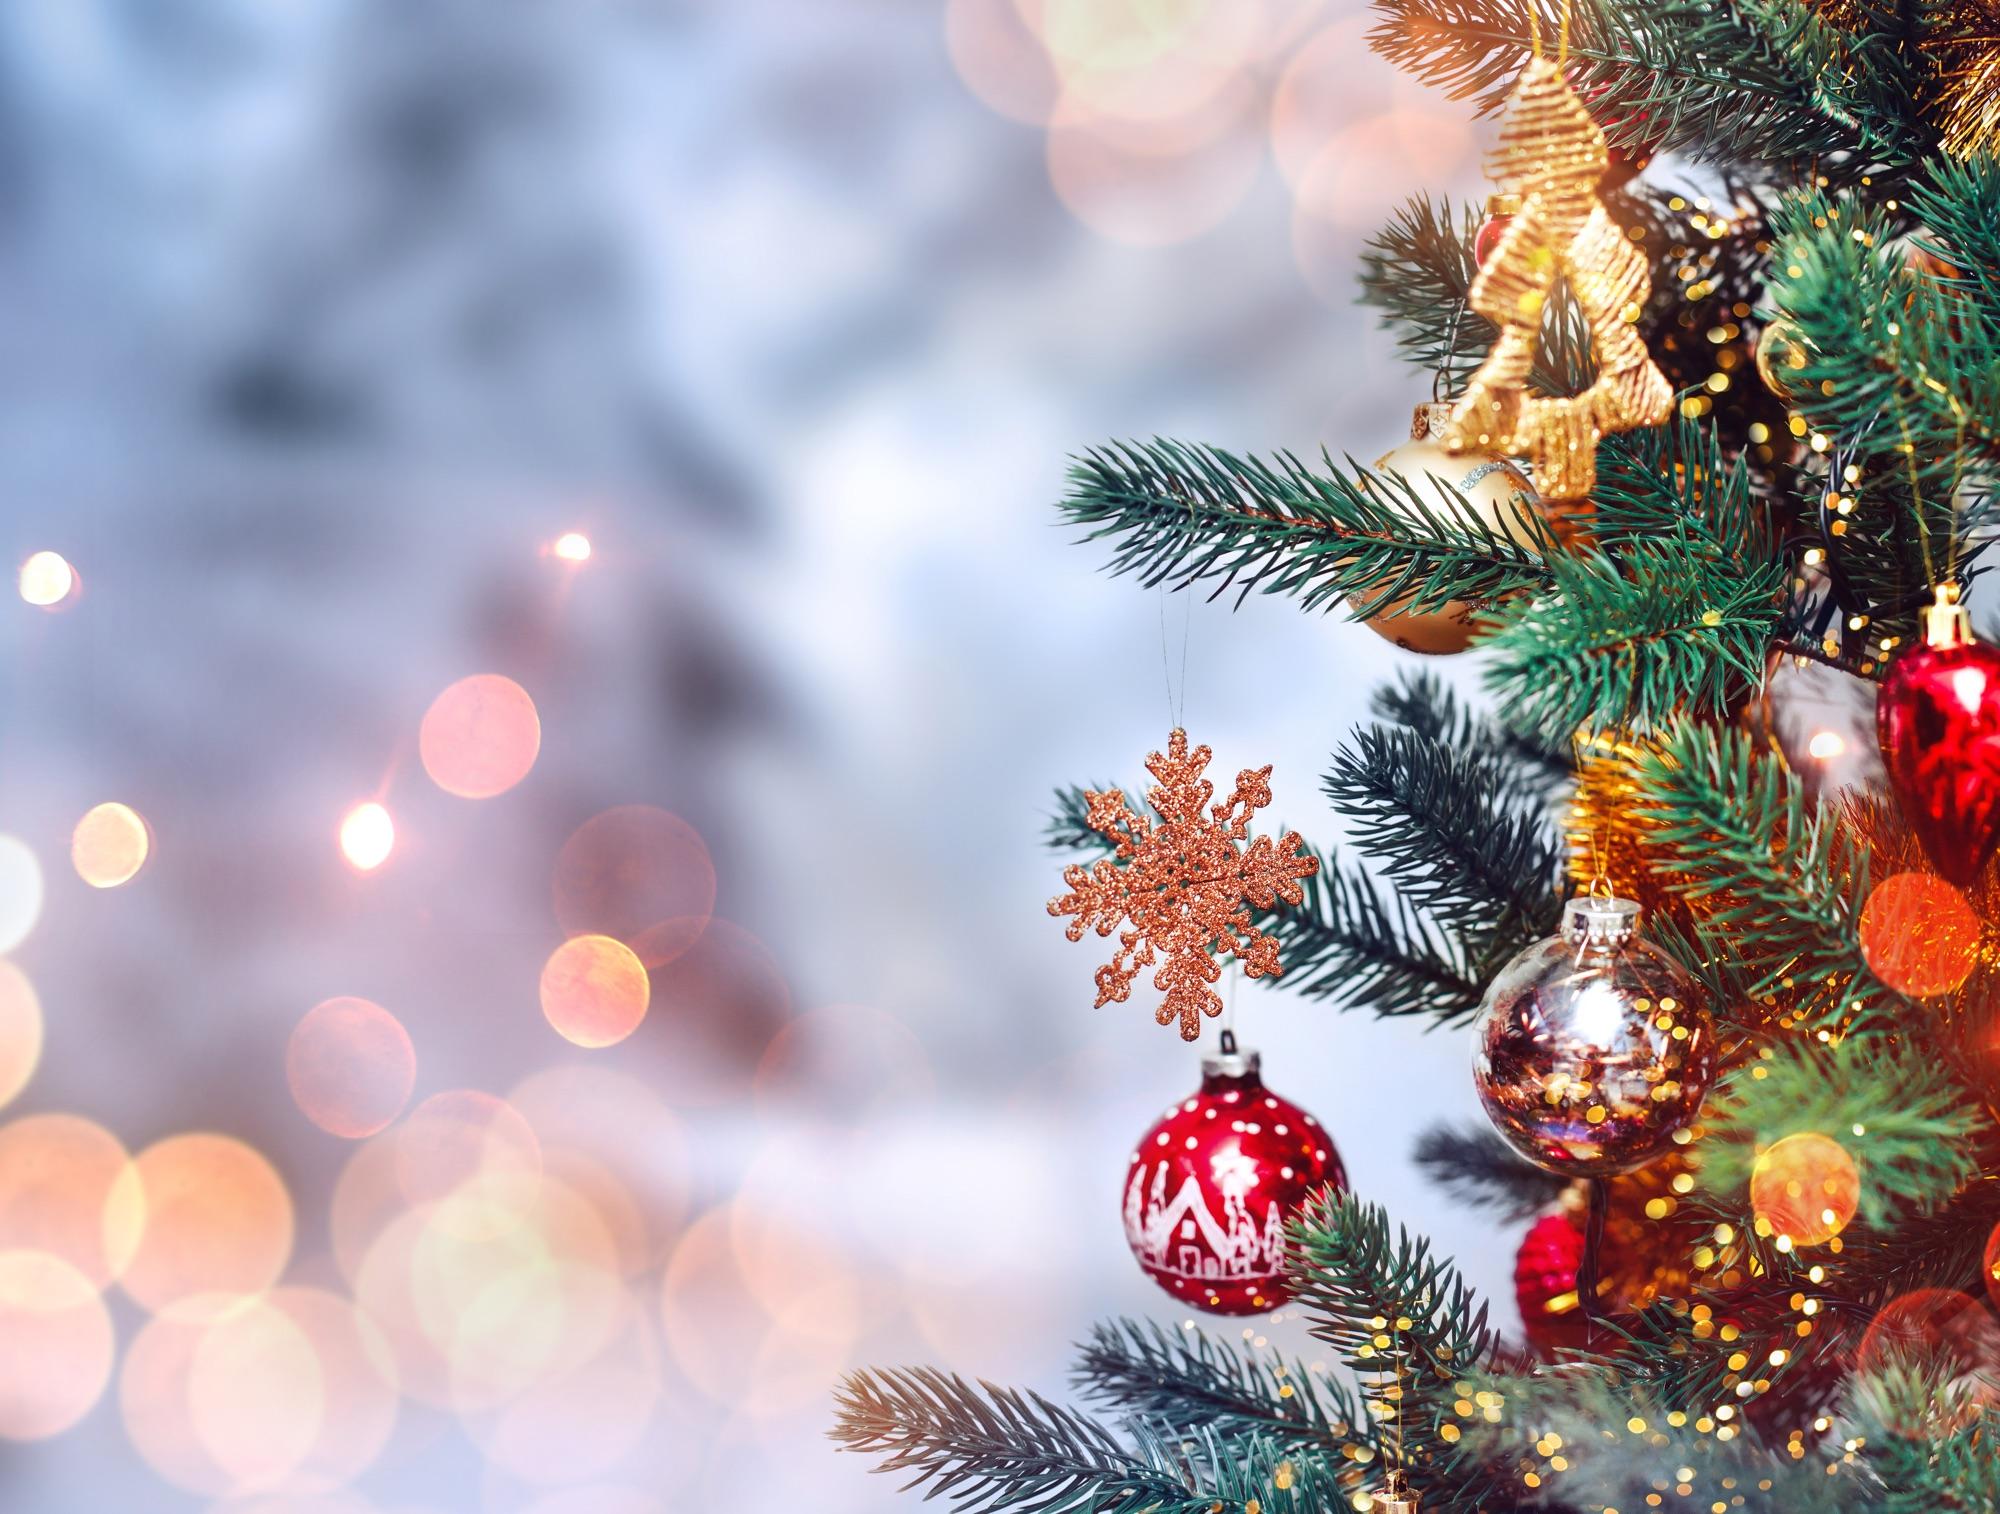 Christmas Tree Sale - Bel Air Lions Club